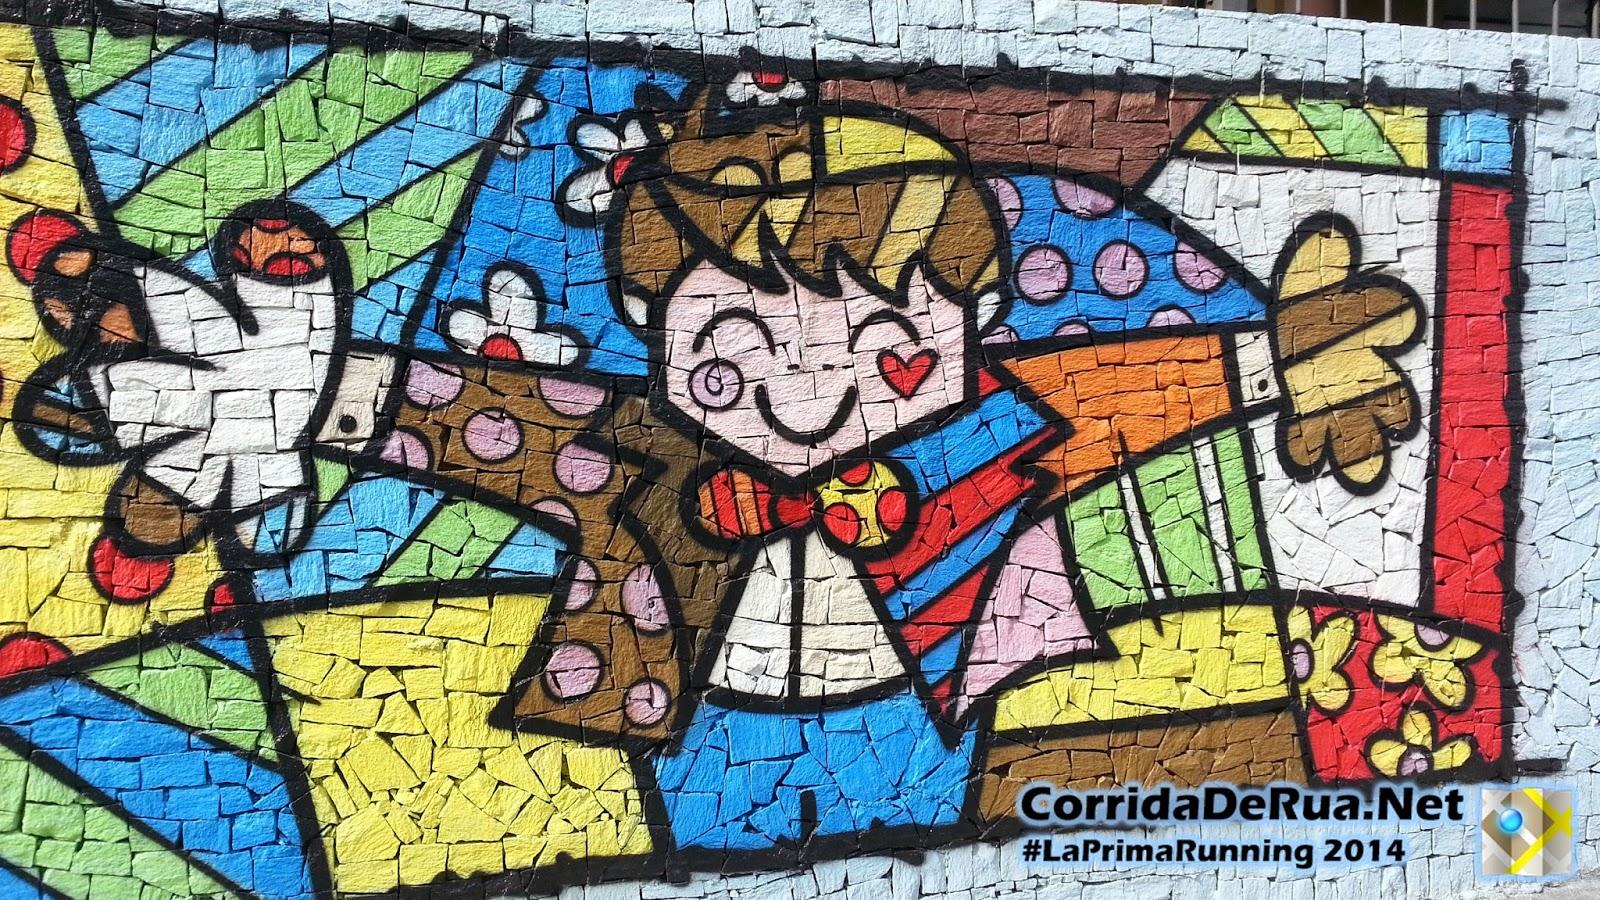 Arte em um muro na Av. Francisco Matarazzo - Corrida De Rua